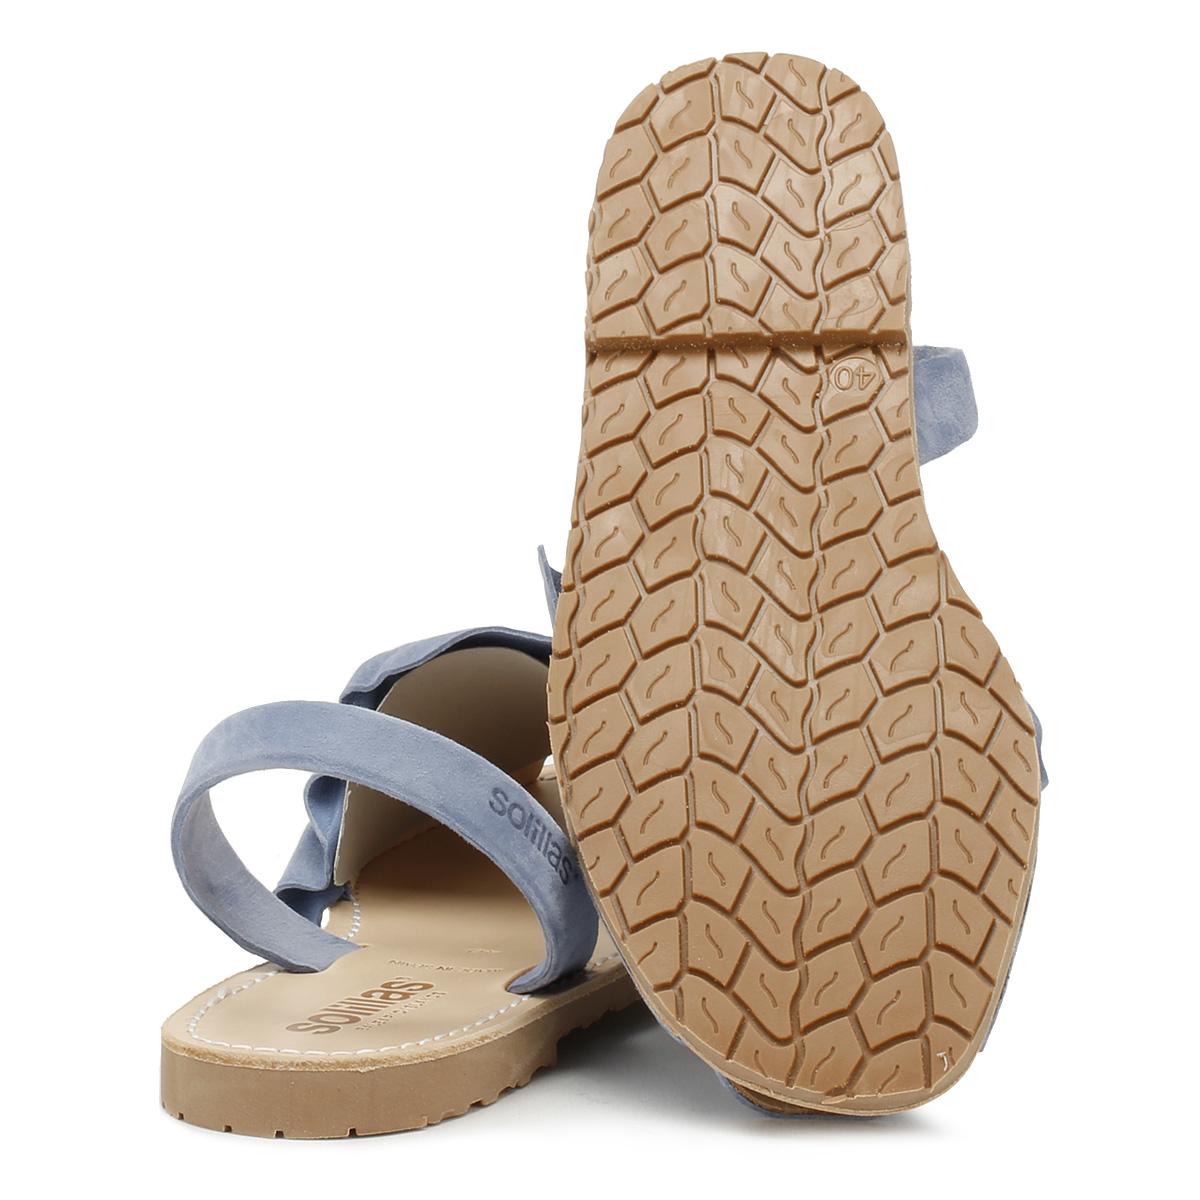 Solillas Sandalias De Mujer Azul Marino pisos de Verano Informal Zapatos De Gamuza Volant